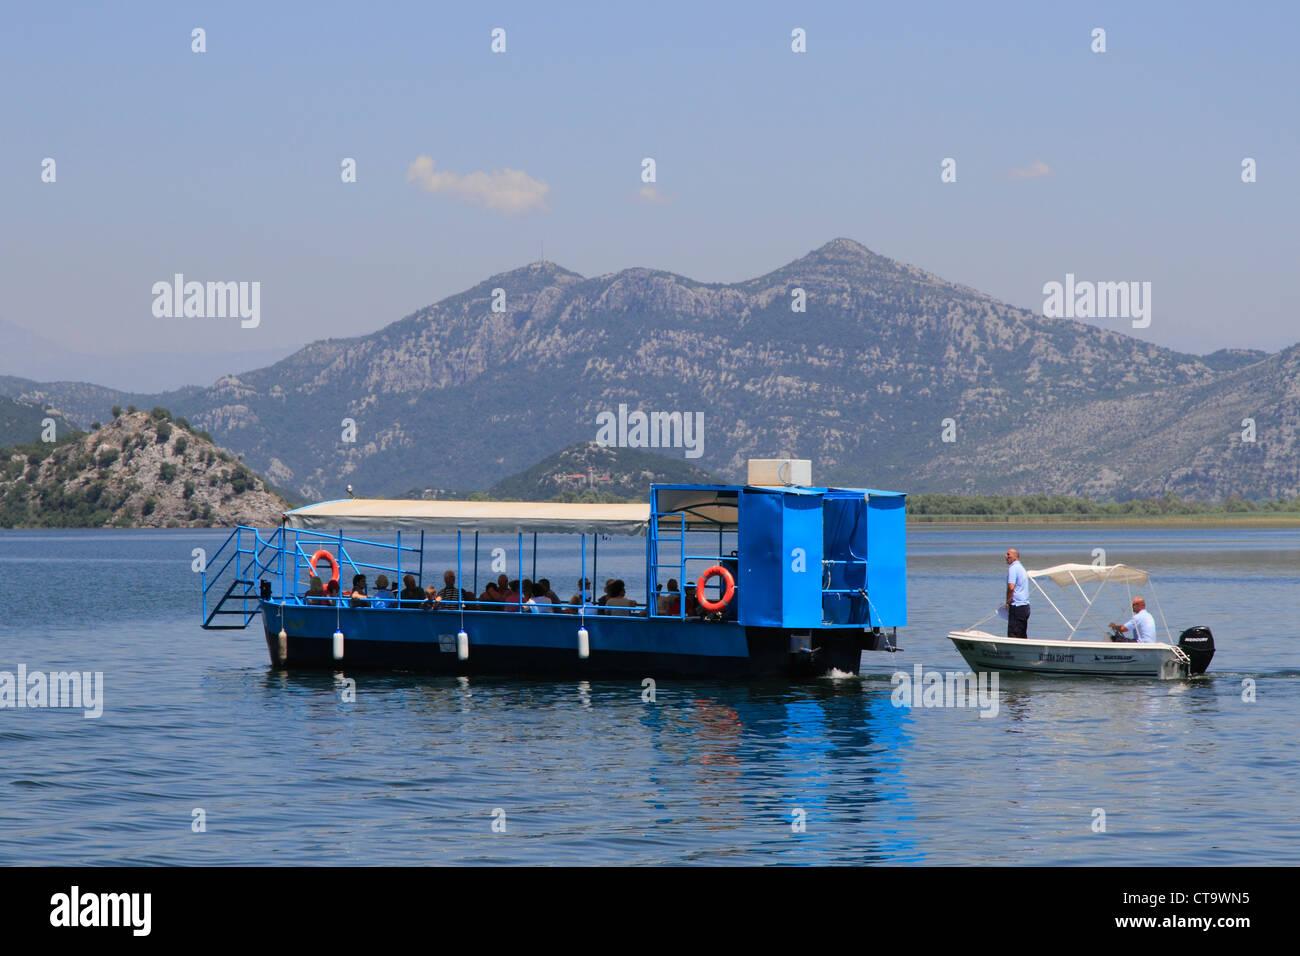 Montenegro, Skadar lake, national park officials check on boat - Stock Image